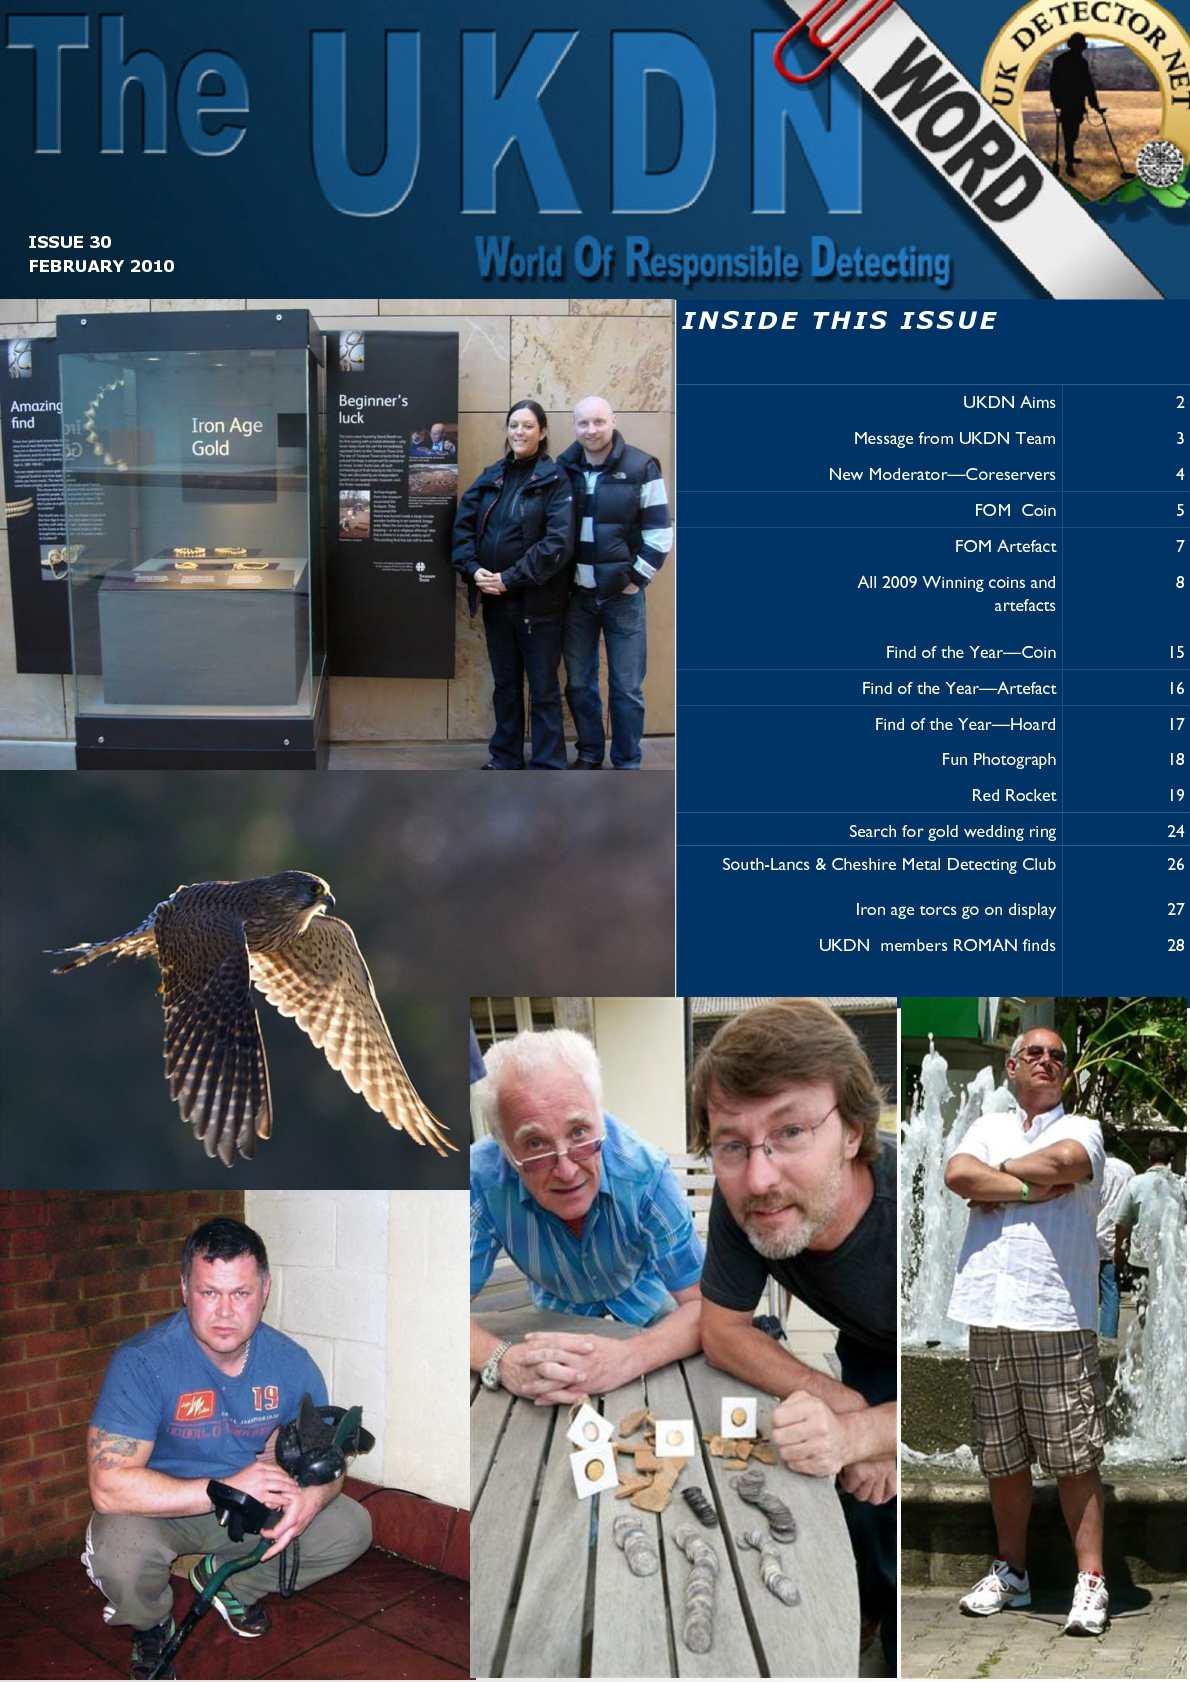 UKDN Word Issue 30 - February 2010